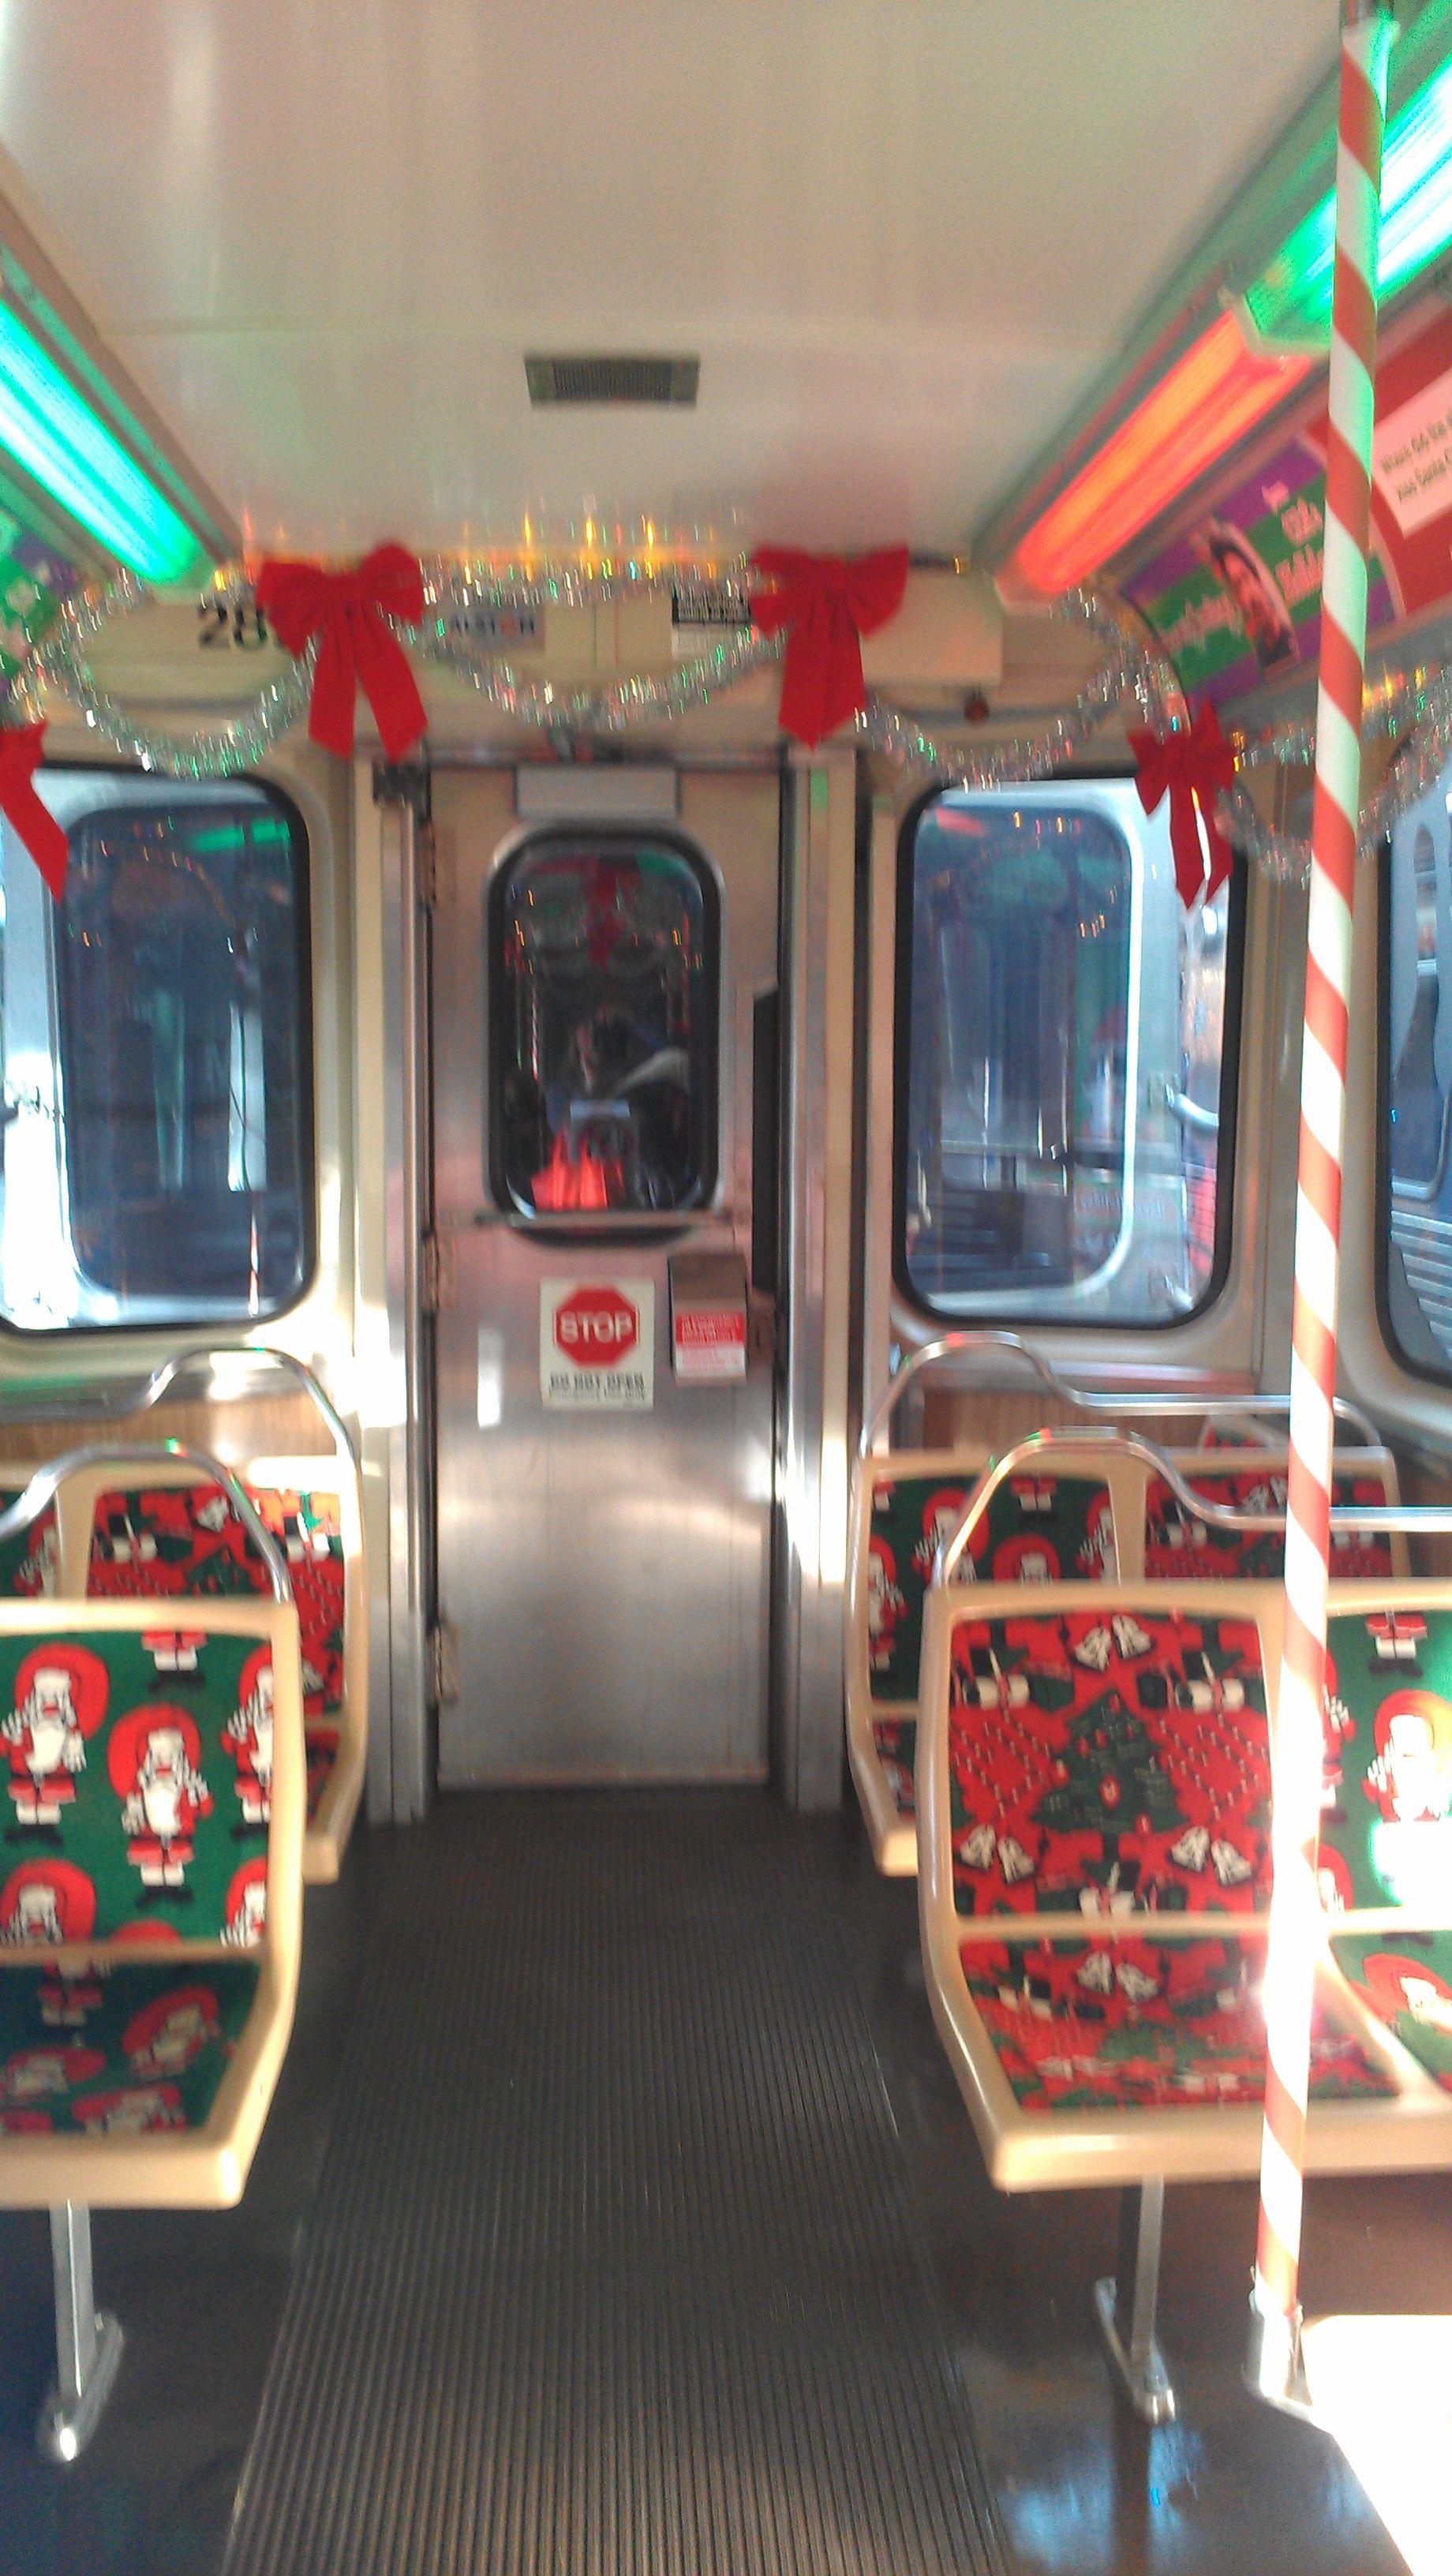 the cta holiday train is not the el its - Cta Christmas Train 2014